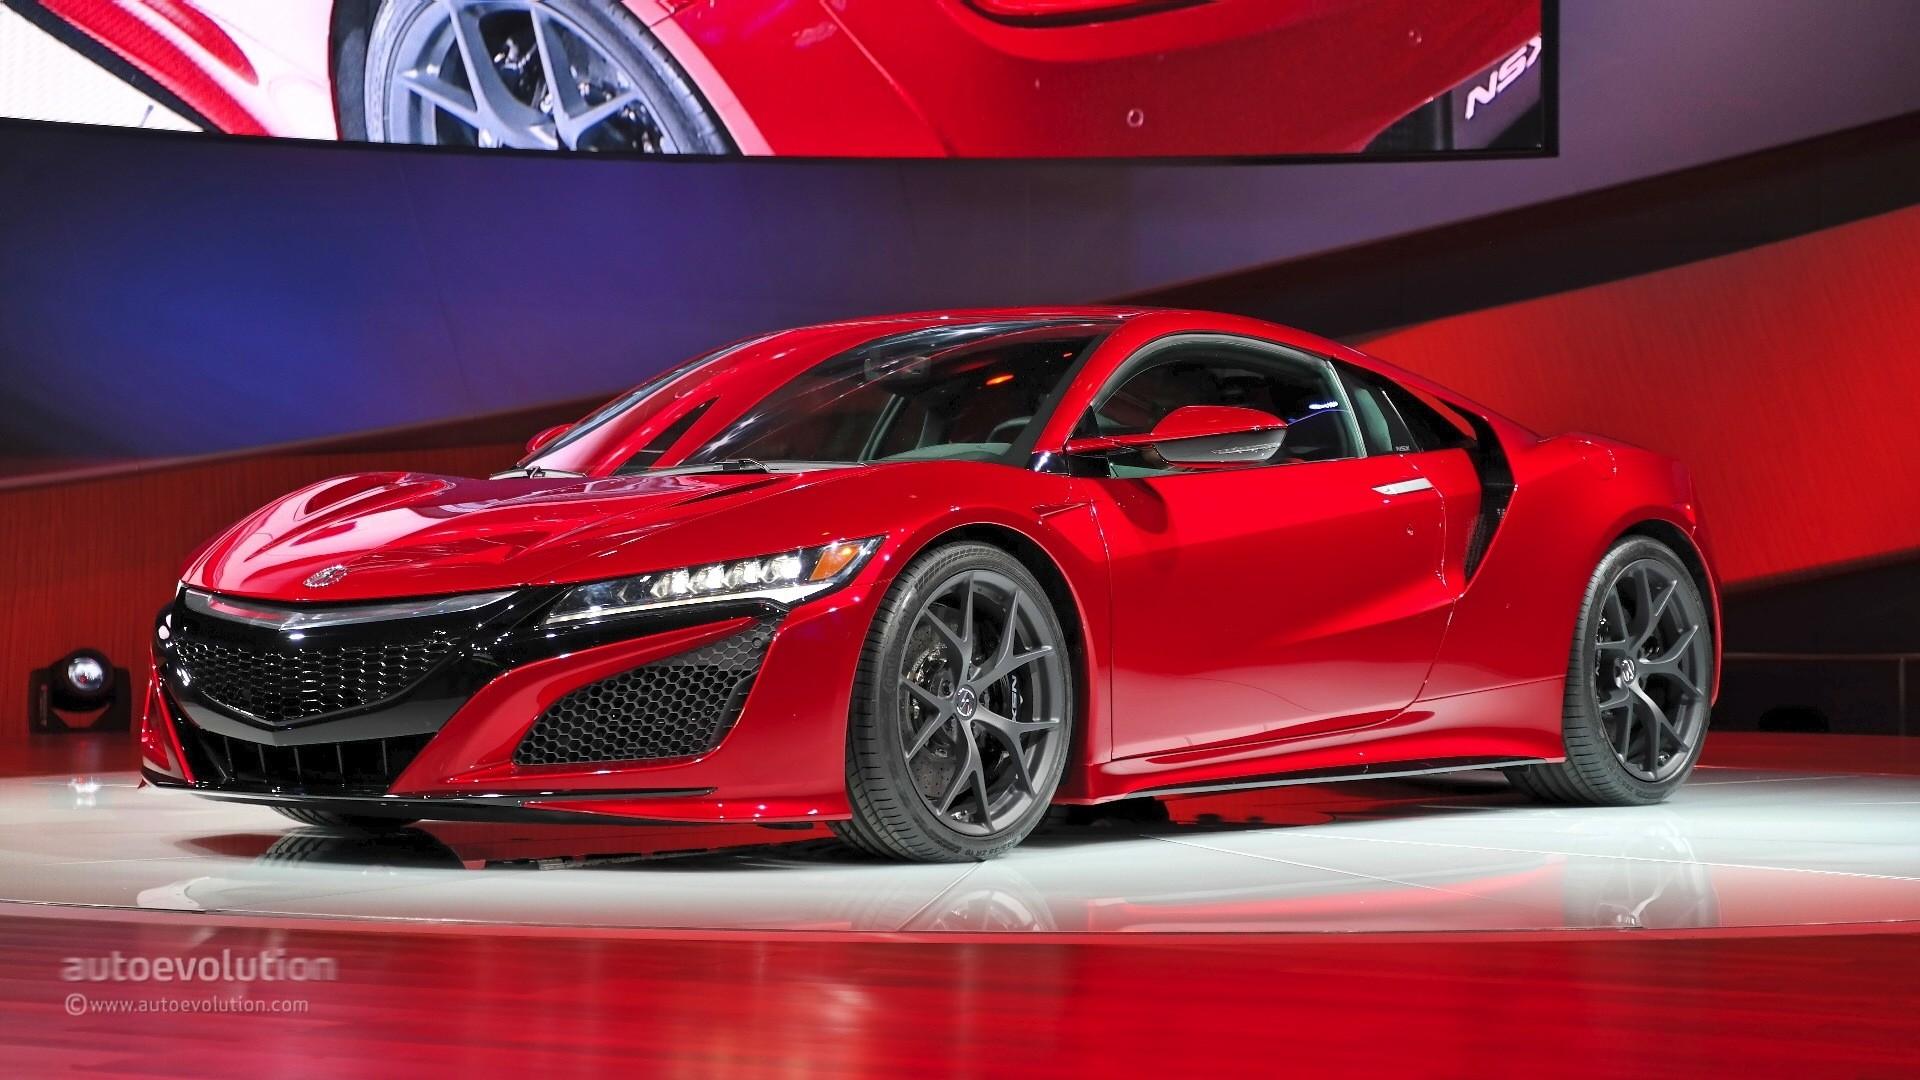 Acura Nsx 2017 Detroit Auto Show